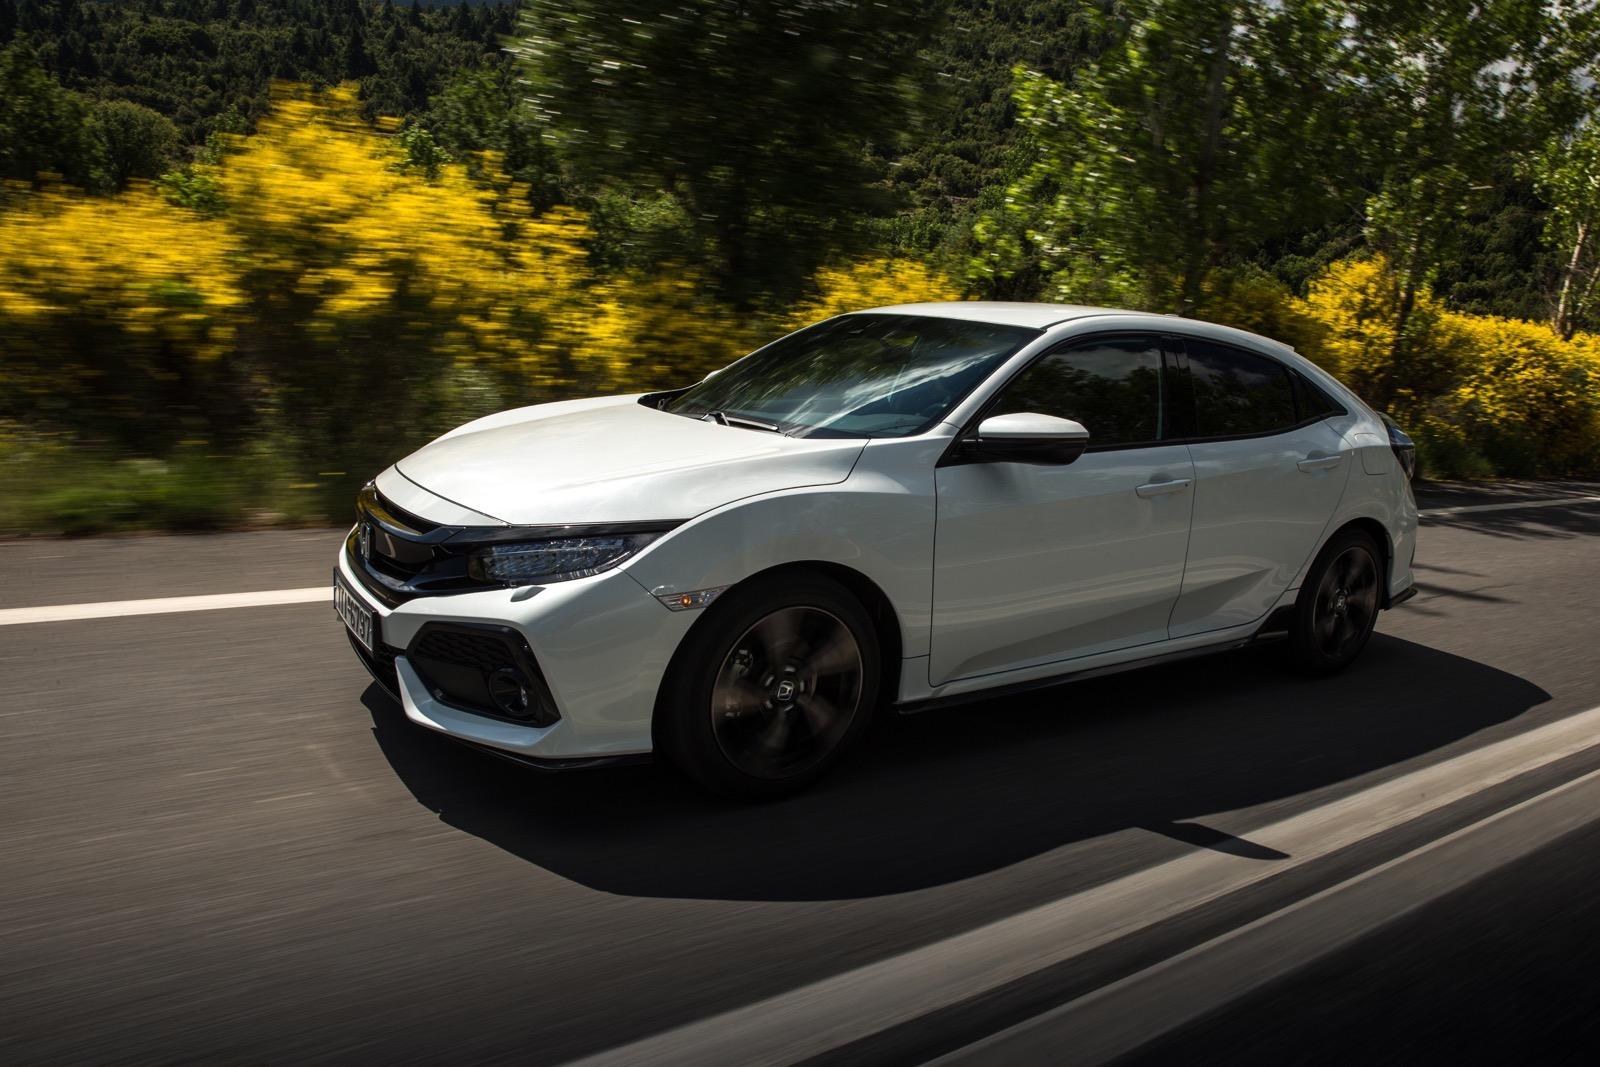 New_Honda_Civic_First_Drive_122